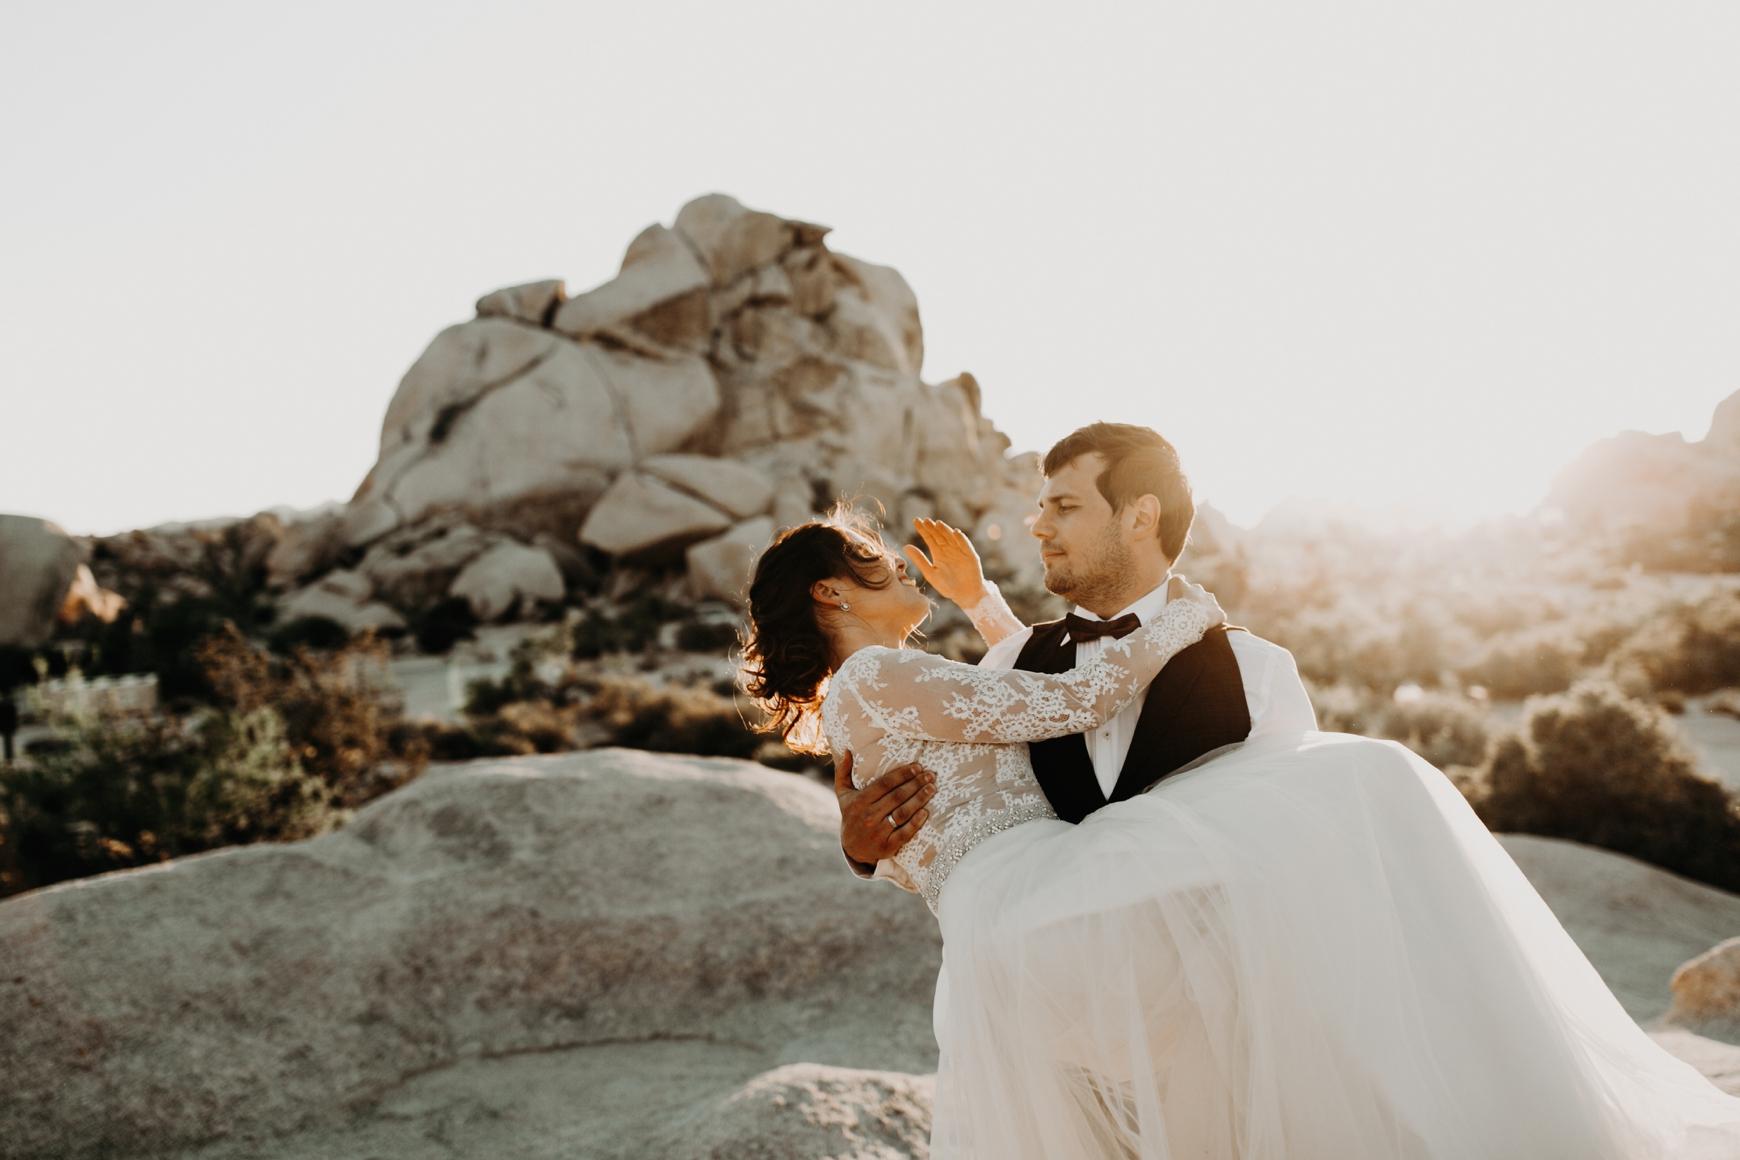 Joshua Tree Bridal Portraits Anastasia & Andrey Emily Magers Photography-272.jpg